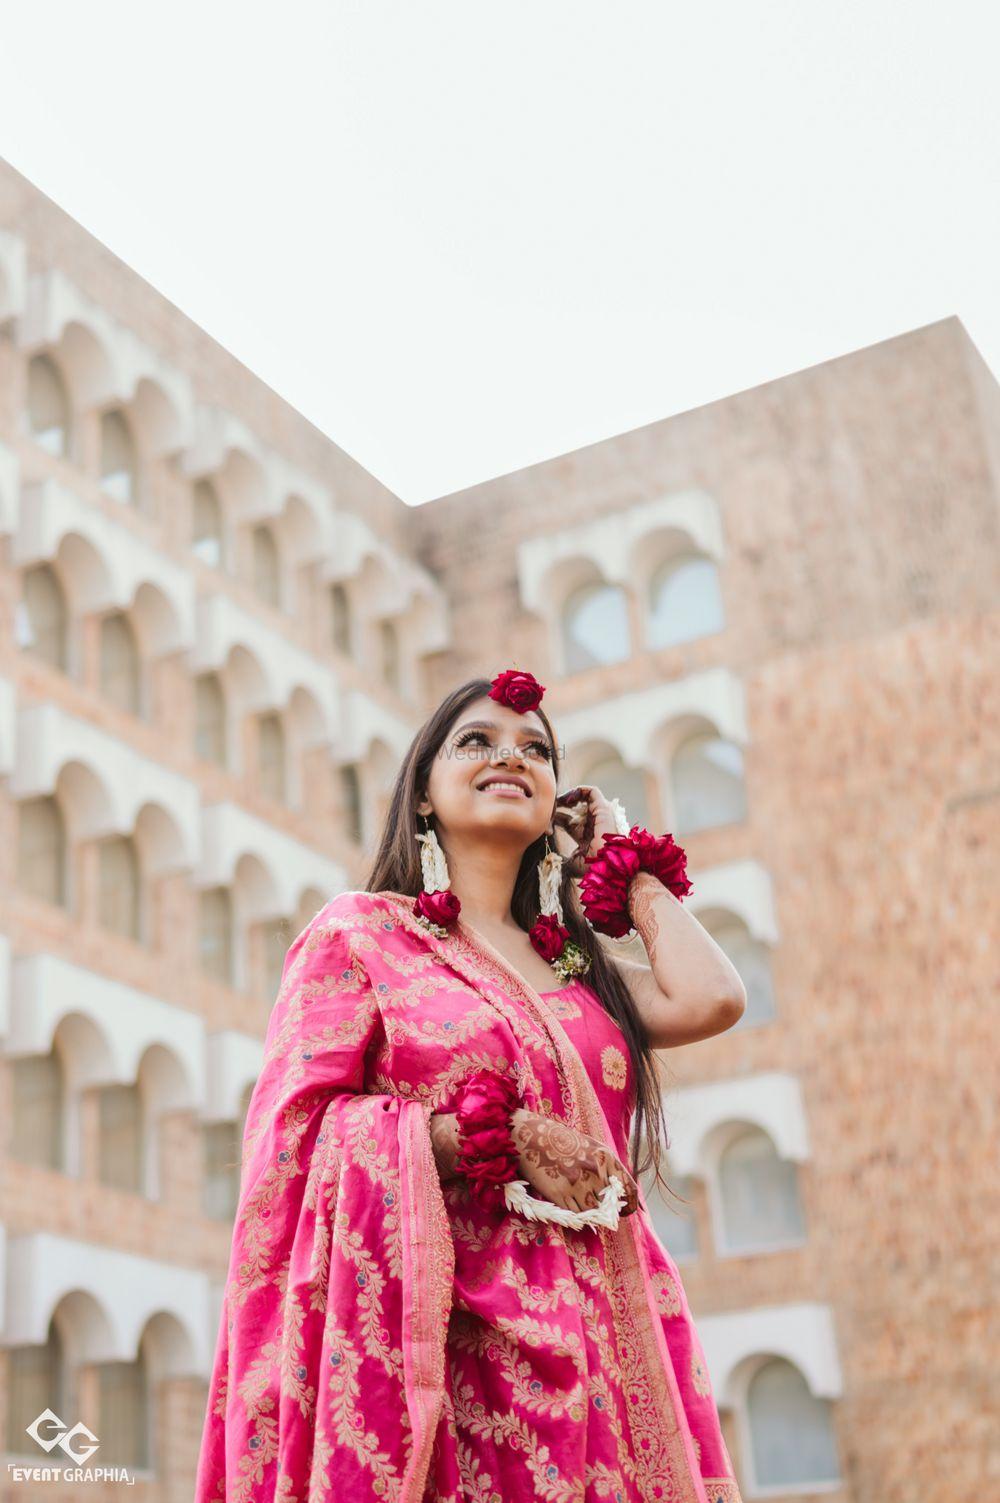 Photo From Tanya-Aditya - By EventGraphia